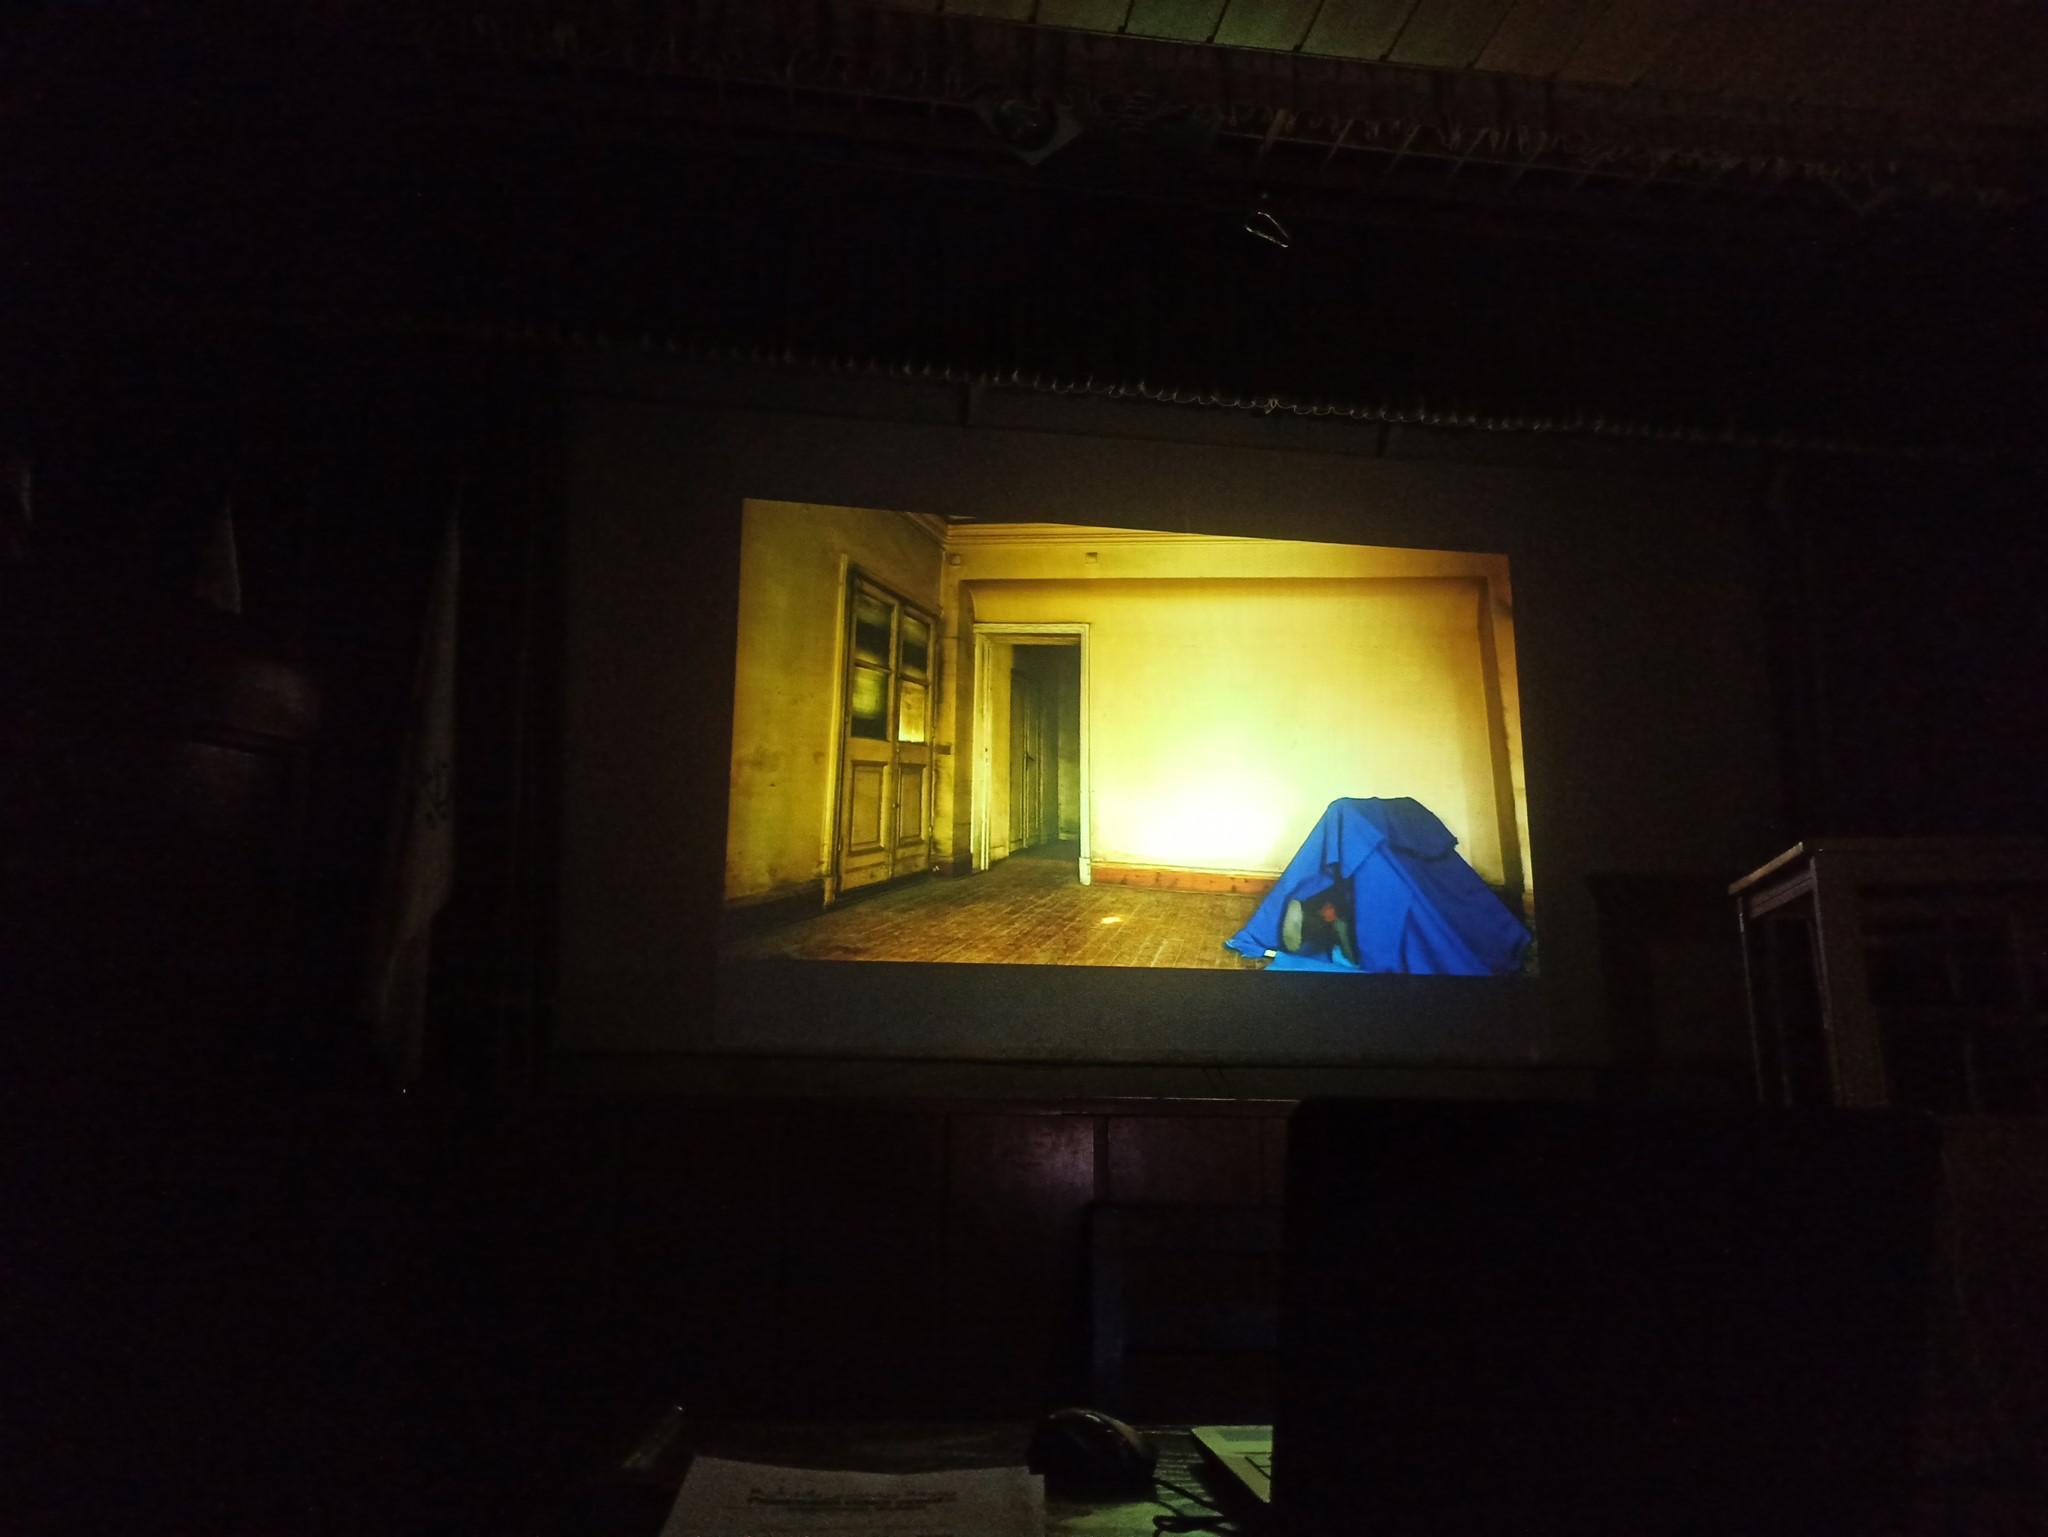 Screening Paadmaan Video Event 2019 at Tehran University of Art, December 14., Tehran/ IRAN